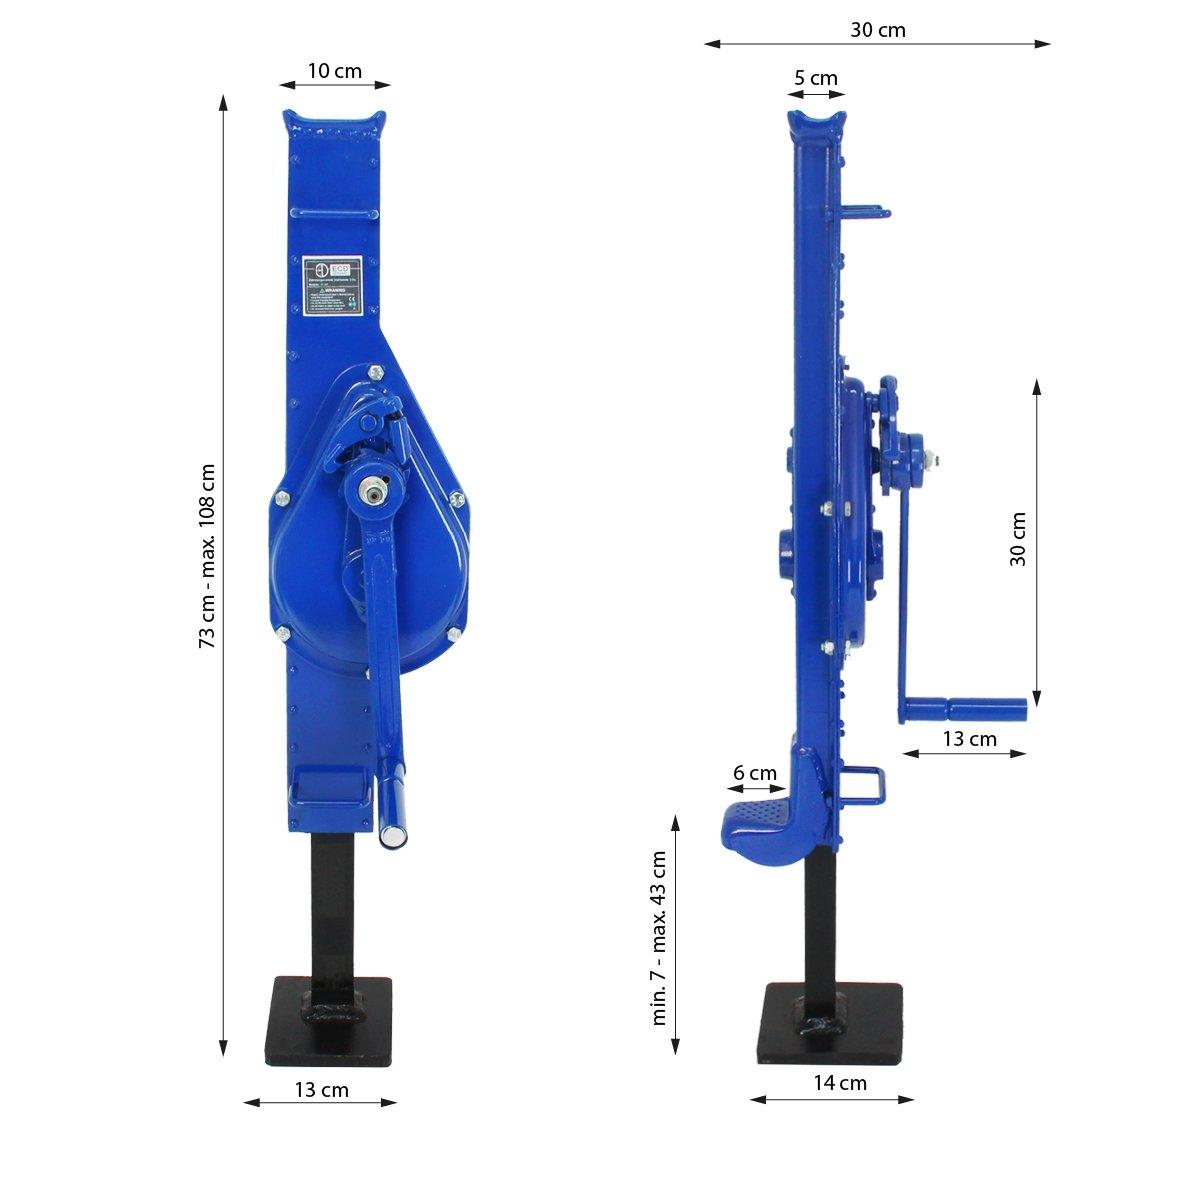 ECD Germany Gato mecánico con Cremallera en Acero 3,0 toneladas Elevador de Carga Extensible con manivela y asa de Transporte Base de Placa 14 cm x 13 cm: ...